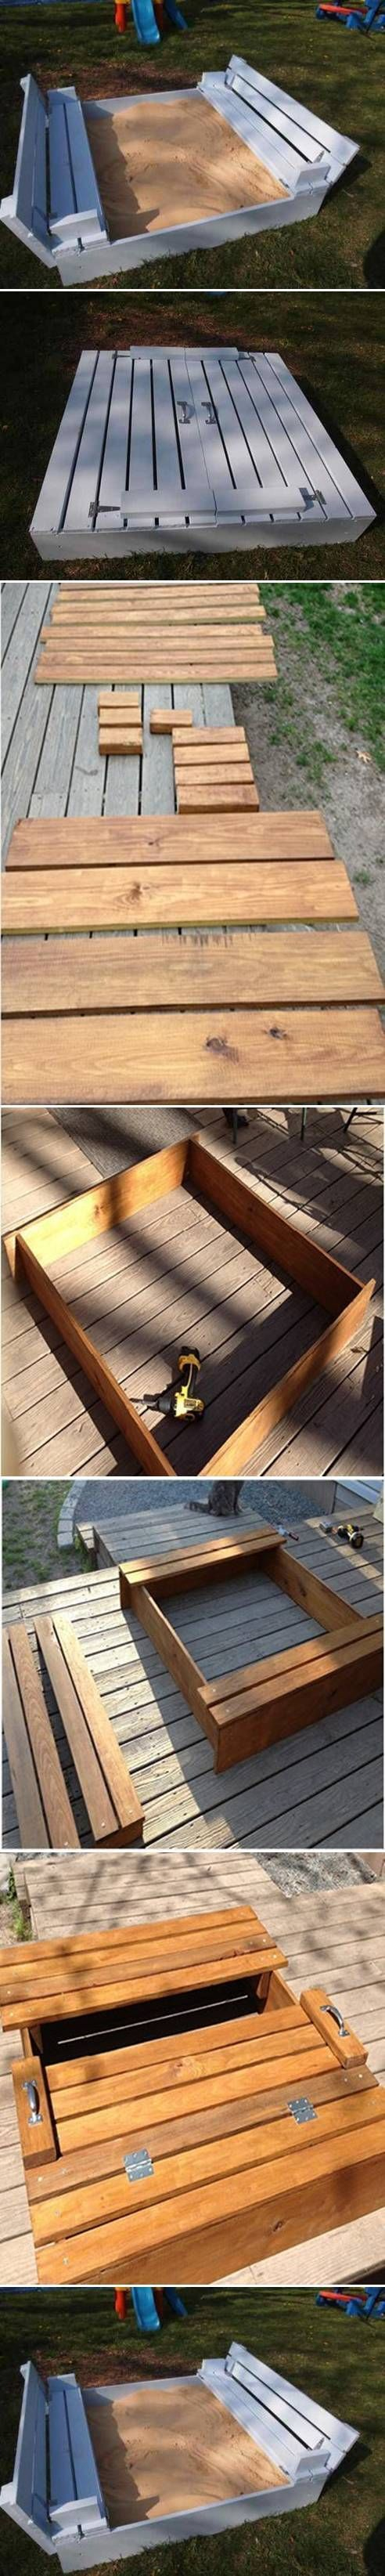 DIY Sandbox for Kids | iCreativeIdeas.com Like Us on Facebook ==> https://www.facebook.com/icreativeideas  www.amandafarwick.com